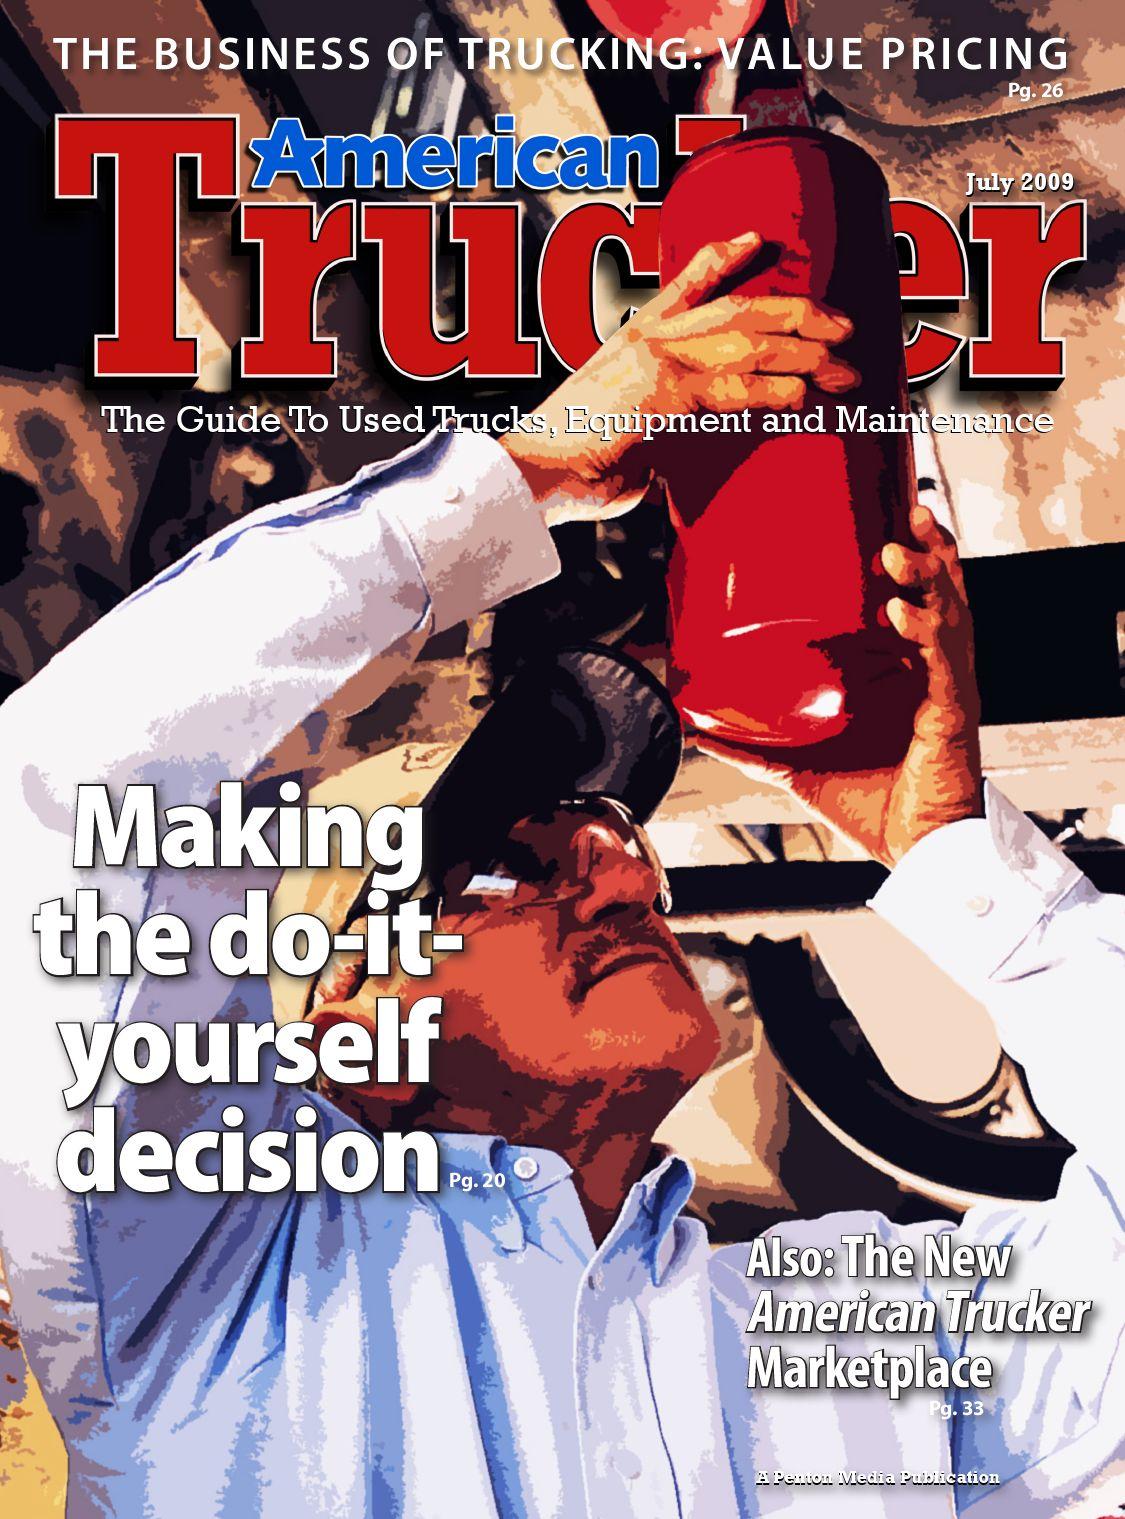 American Trucker West July Edition by American Trucker - issuu